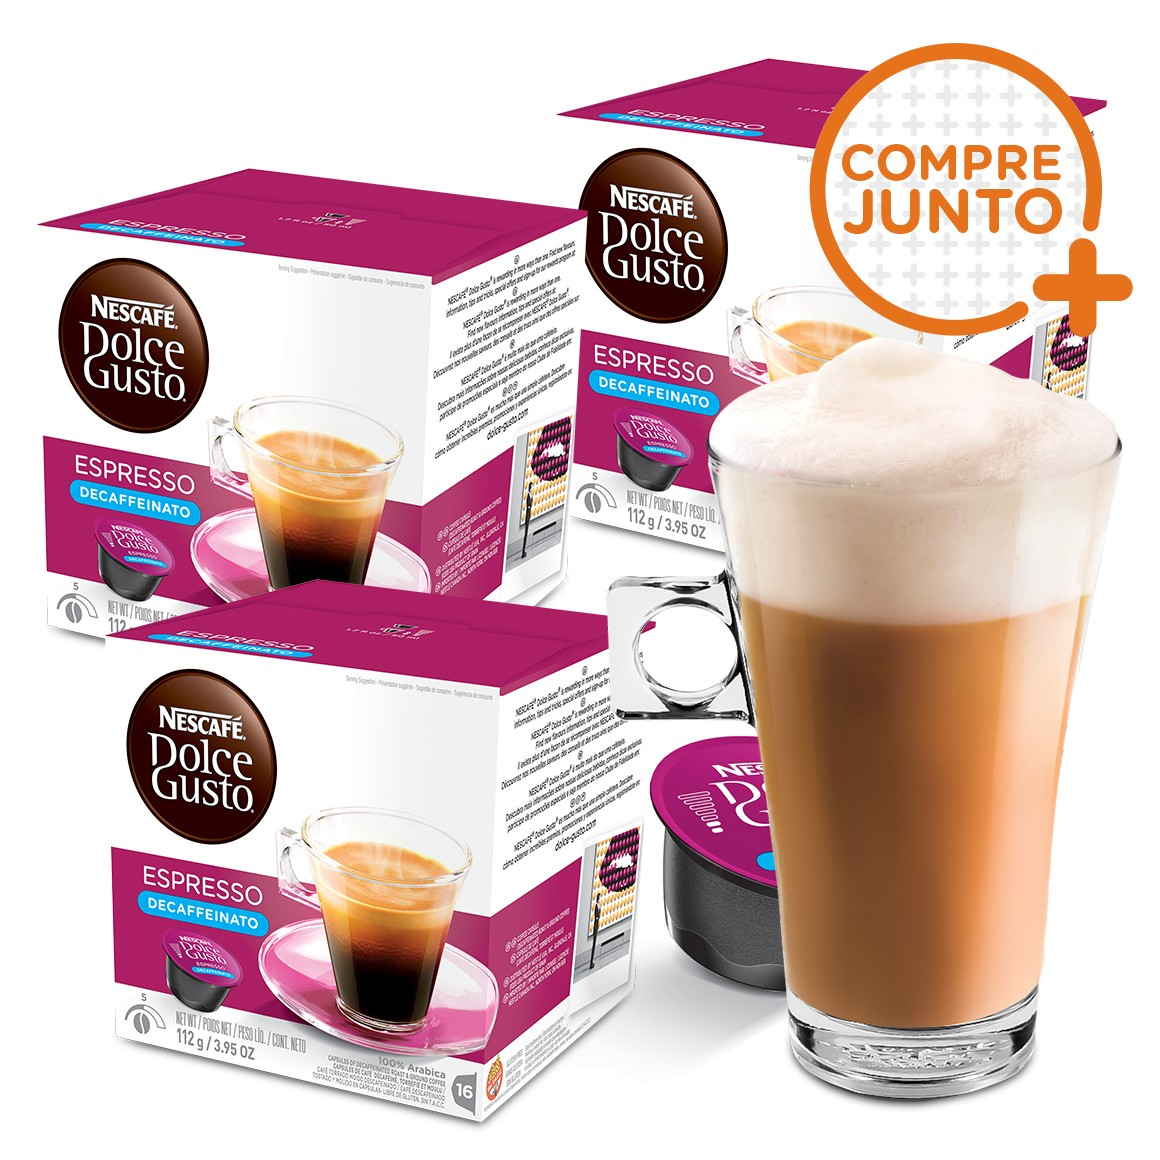 Kit 48 Cápsulas Nescafé Dolce Gusto Espresso Descafeinado Nestlé + 1 Taça de Café Dolce Gusto 268ml